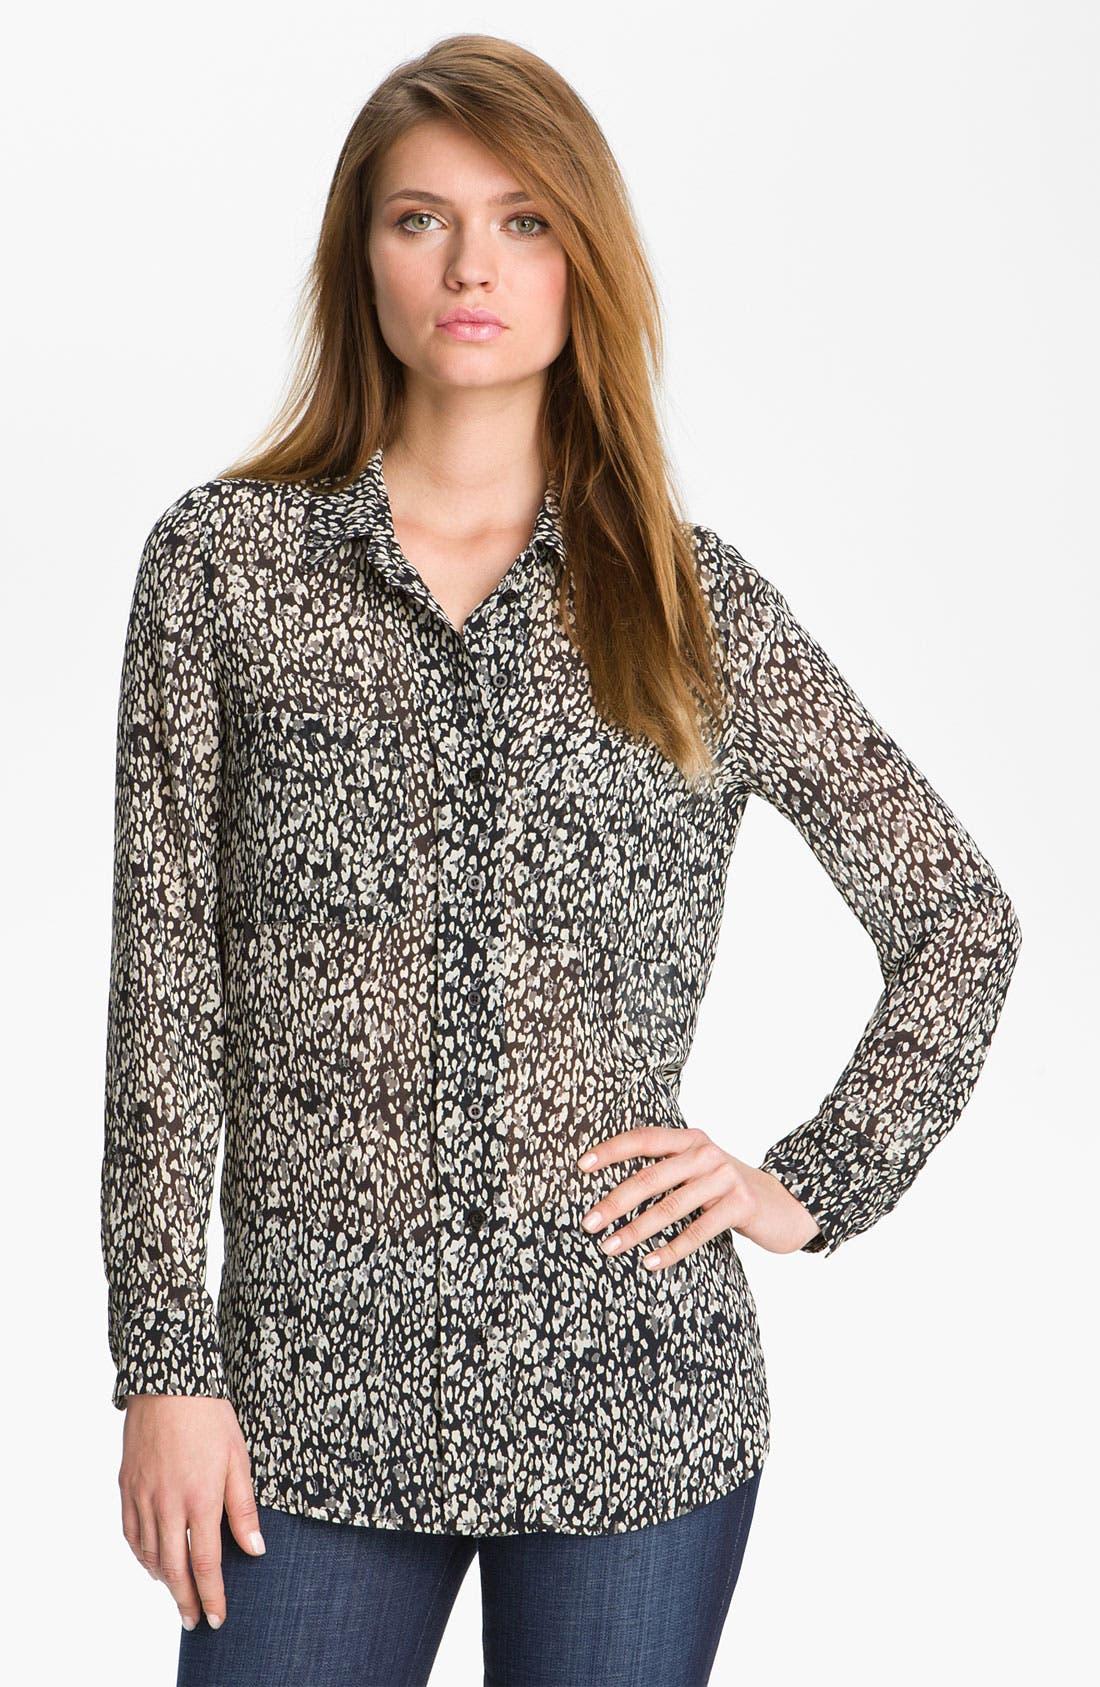 Alternate Image 1 Selected - Mcginn Leopard Print Blouse